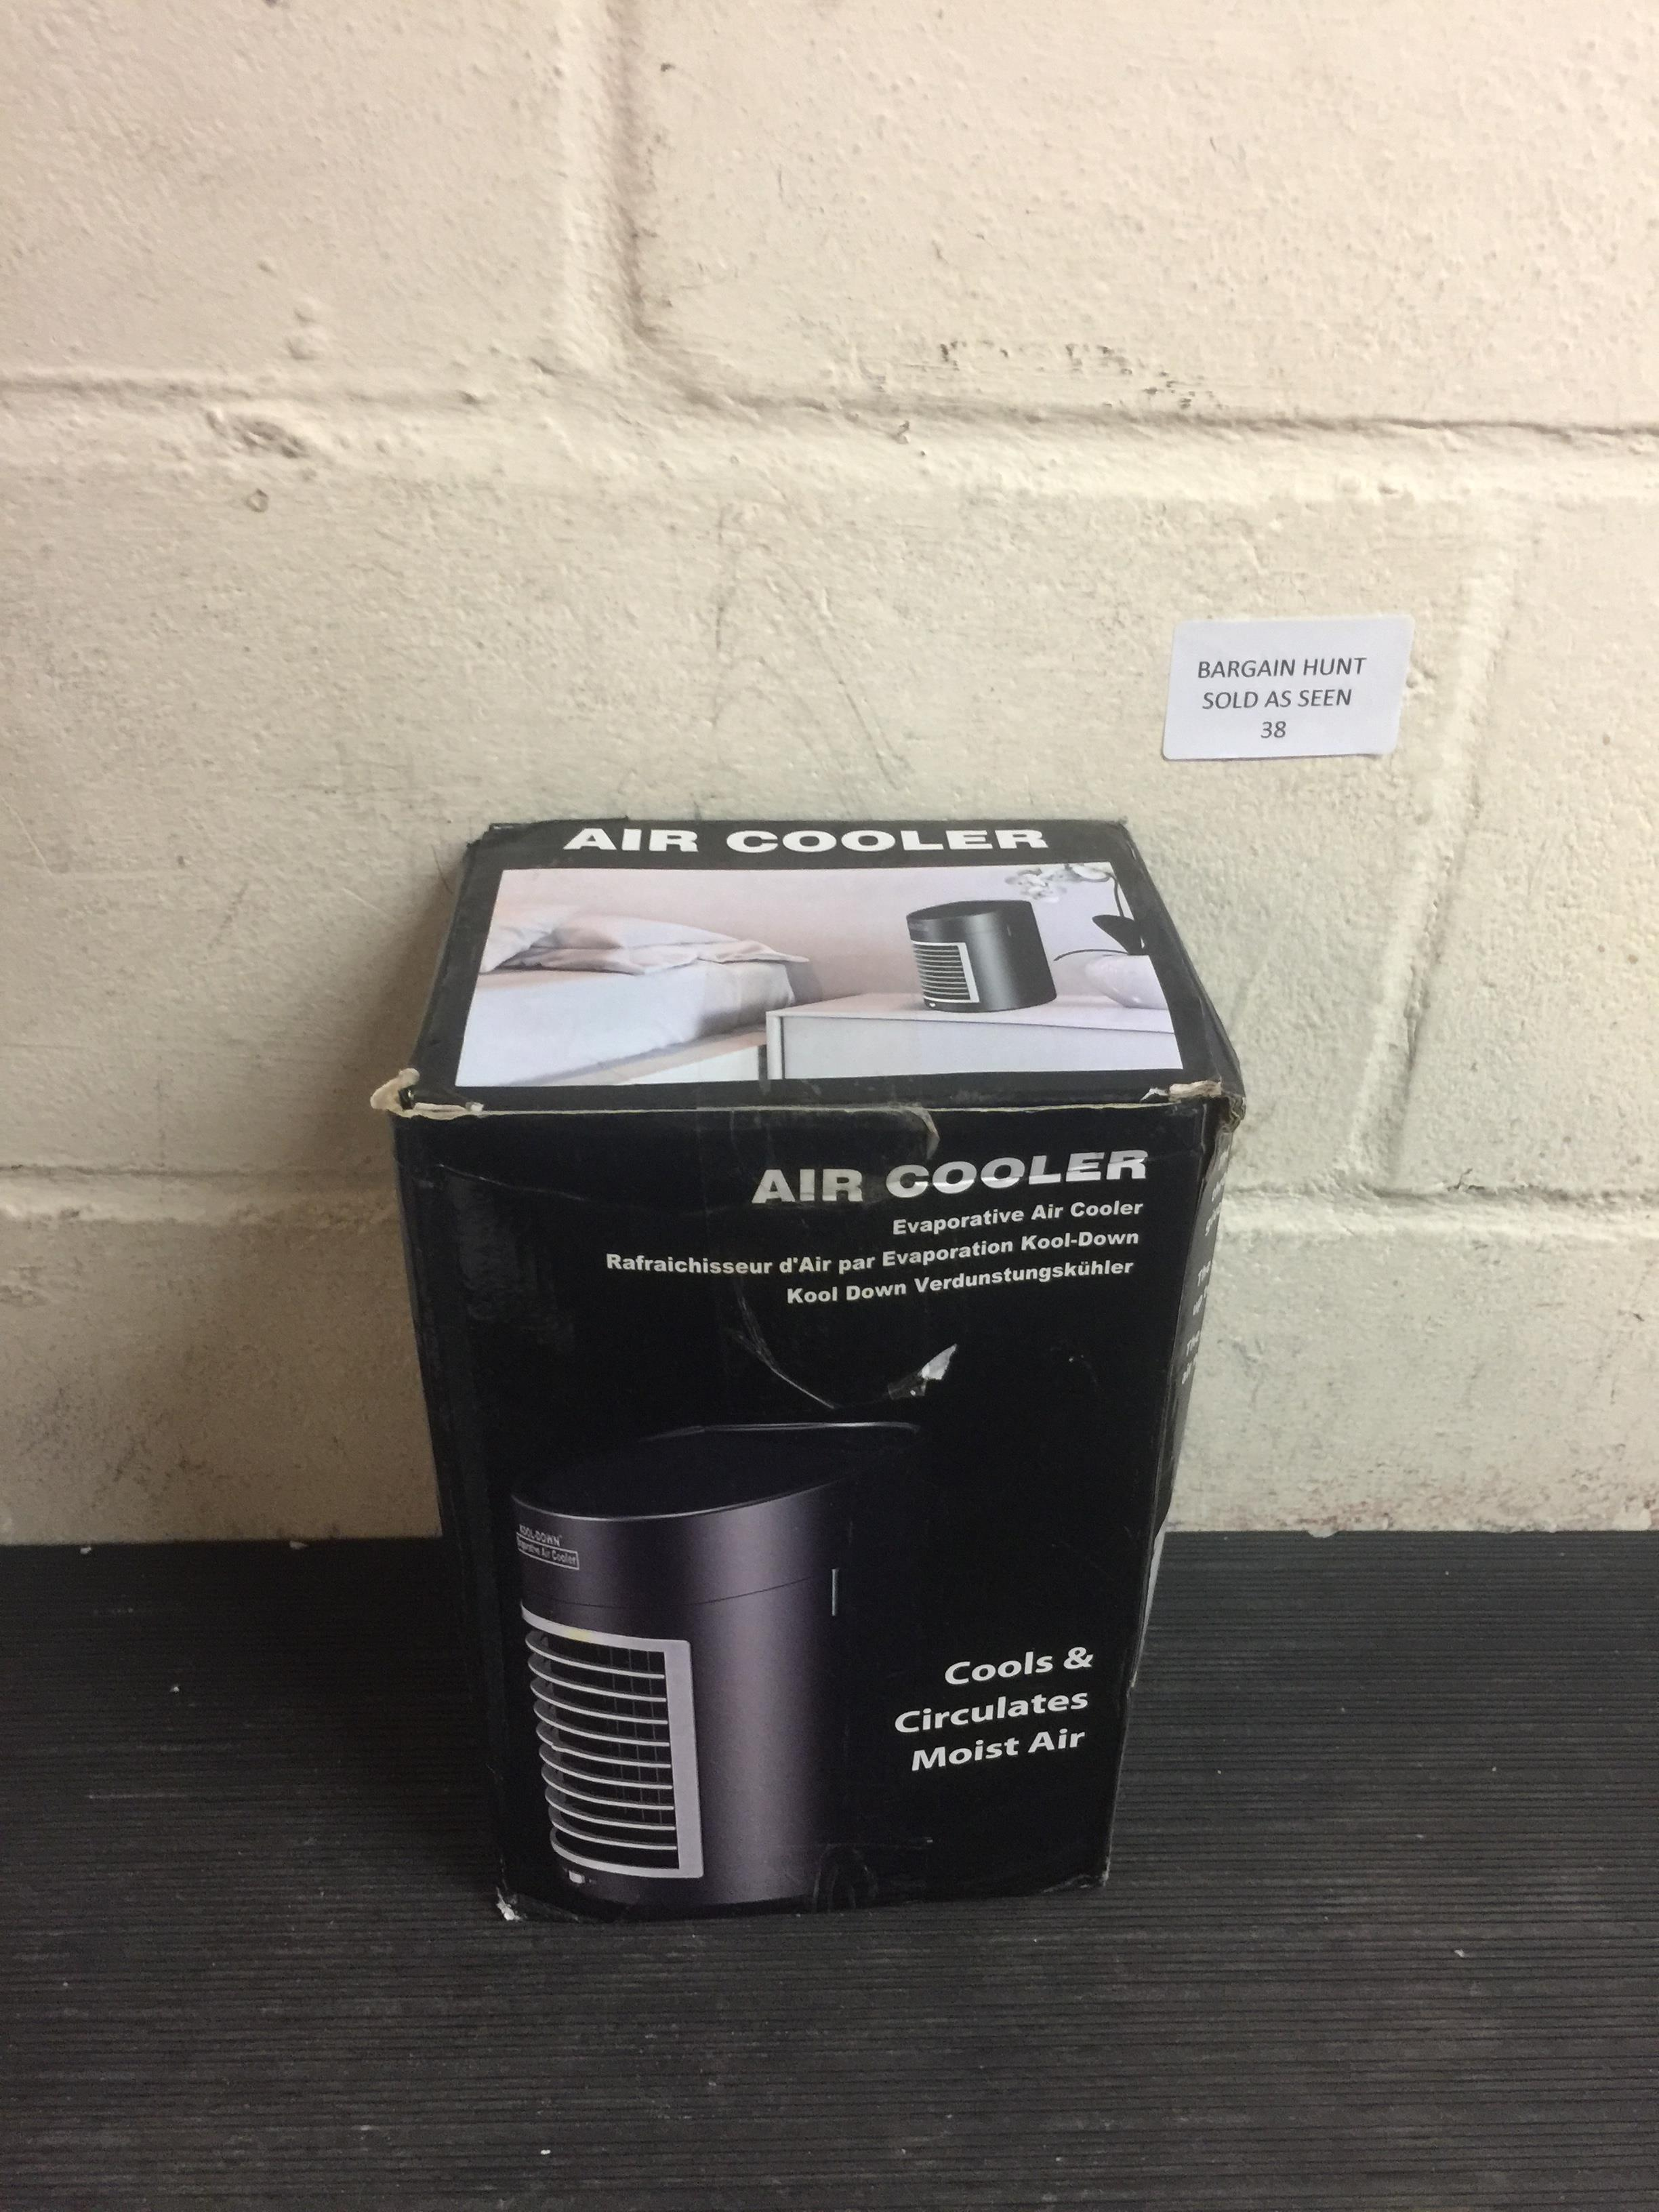 Lot 38 - Evaporative Air Cooler